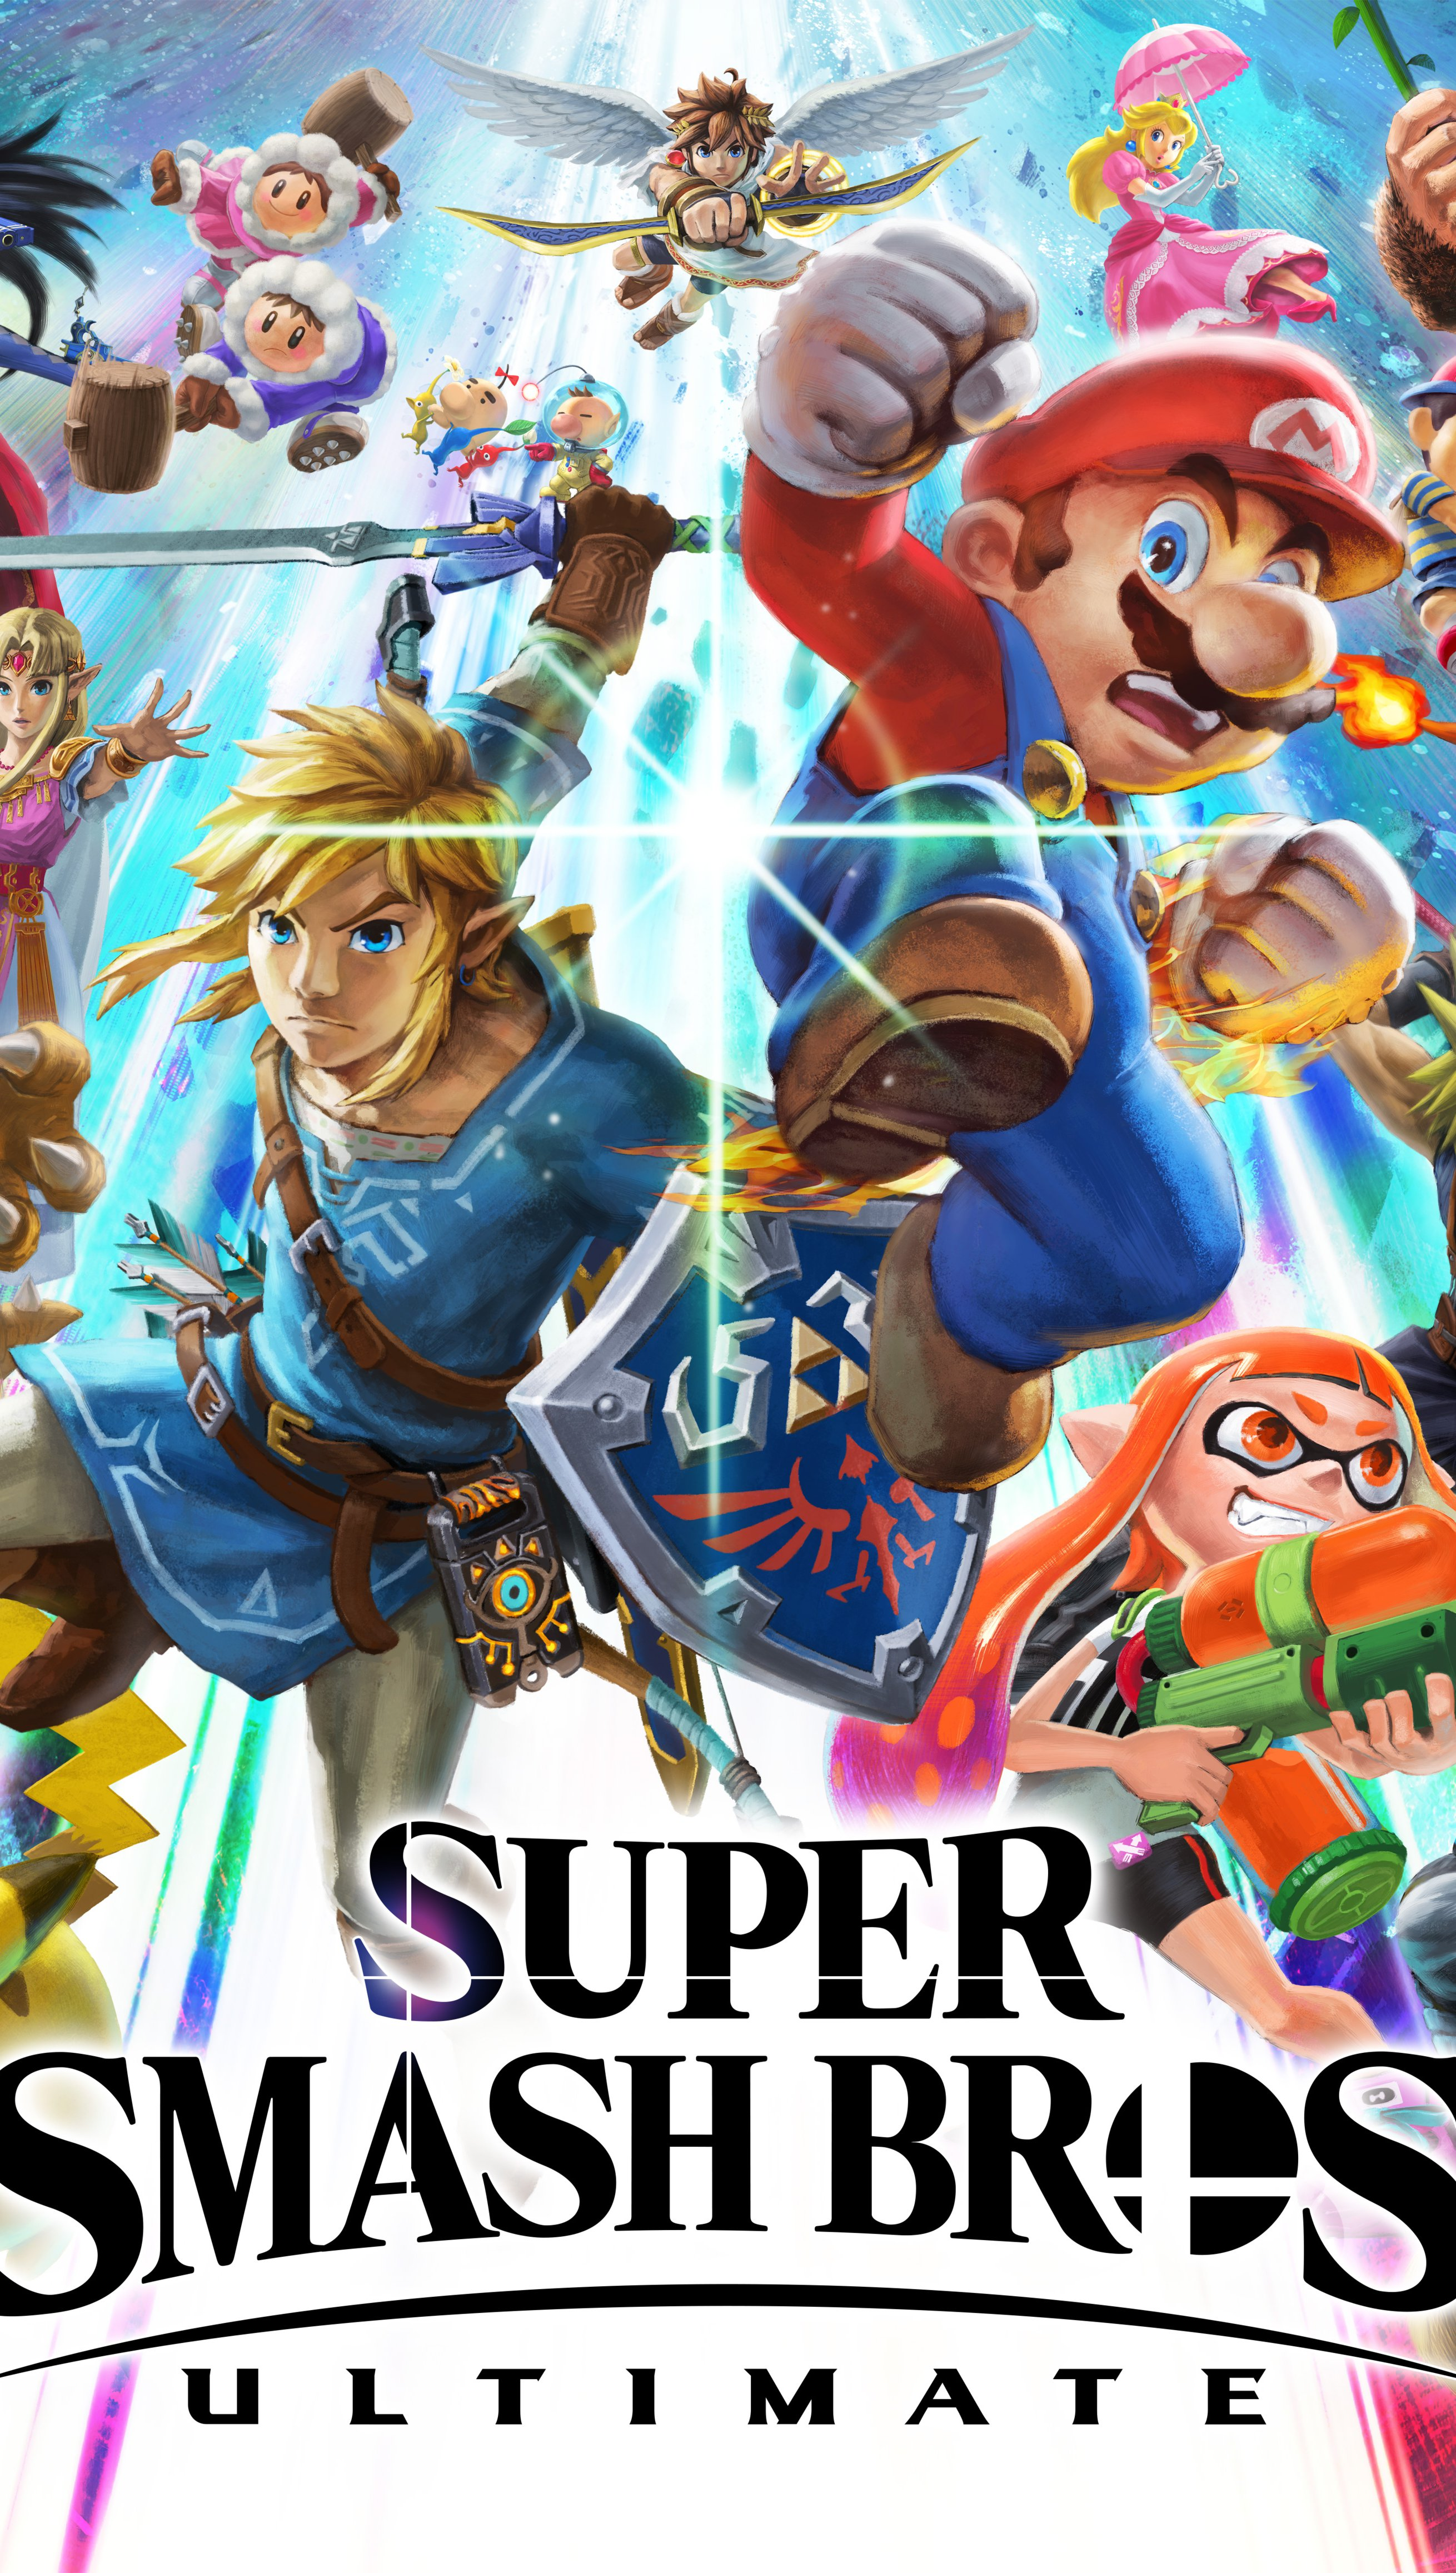 Wallpaper Super Smash Bros Ultimate 8k Vertical